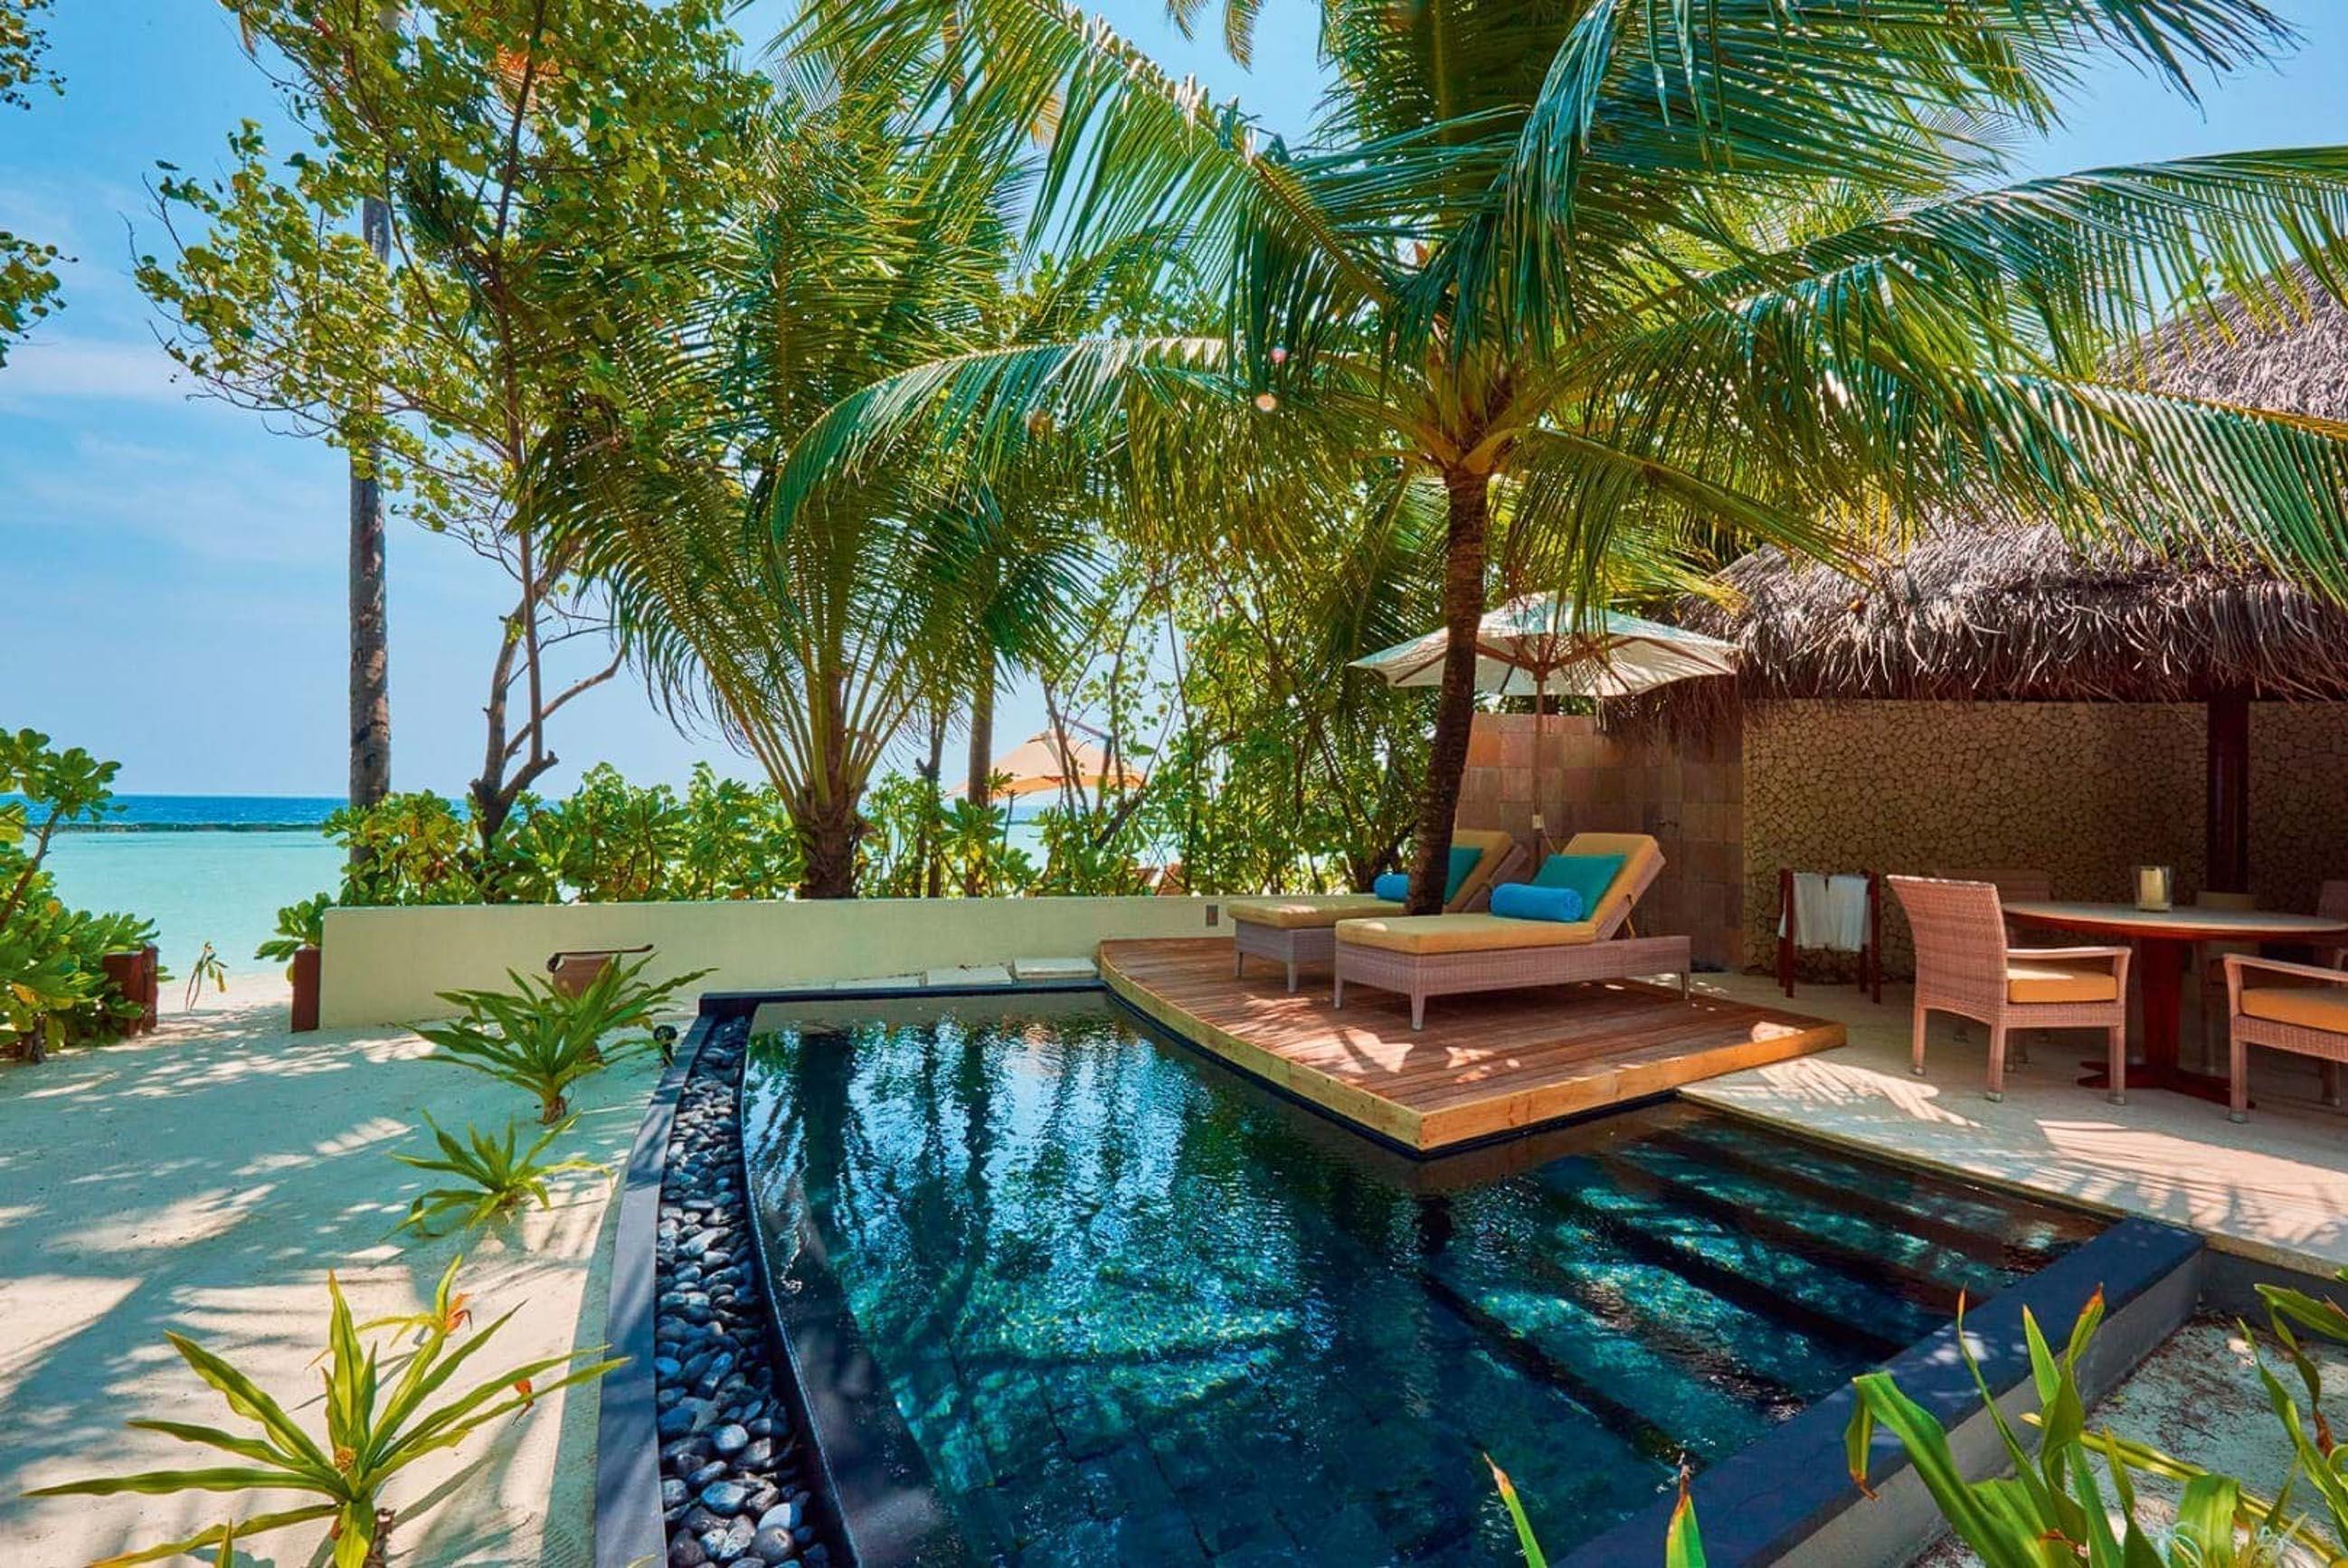 https://bubo.sk/uploads/galleries/16372/halaveli-maldives-2016-beach-villa-pool-3.jpg